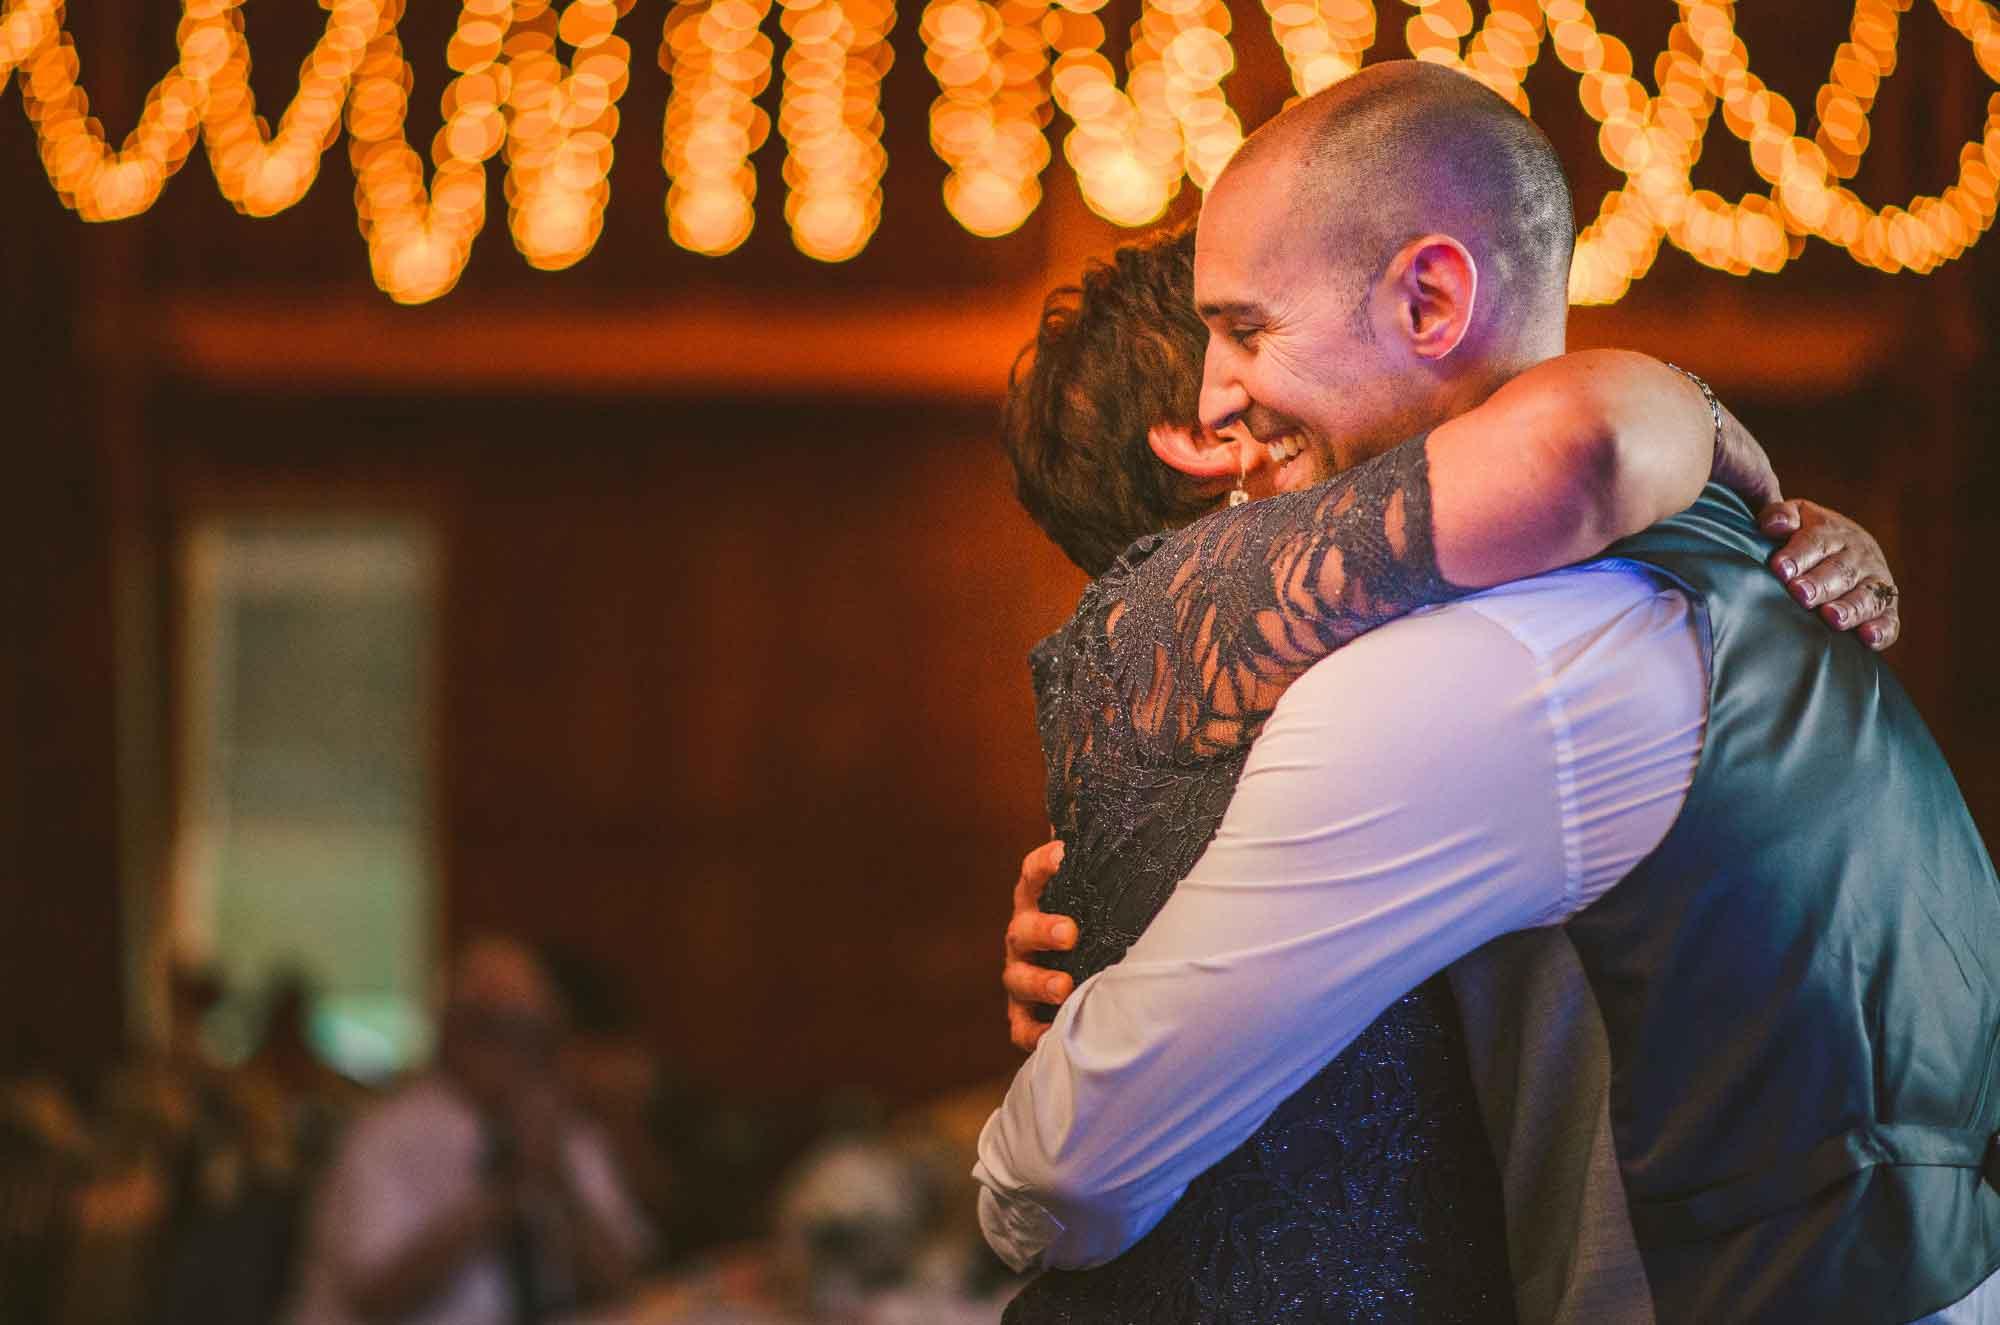 29-wedding-reception-mother-son-hug.jpg